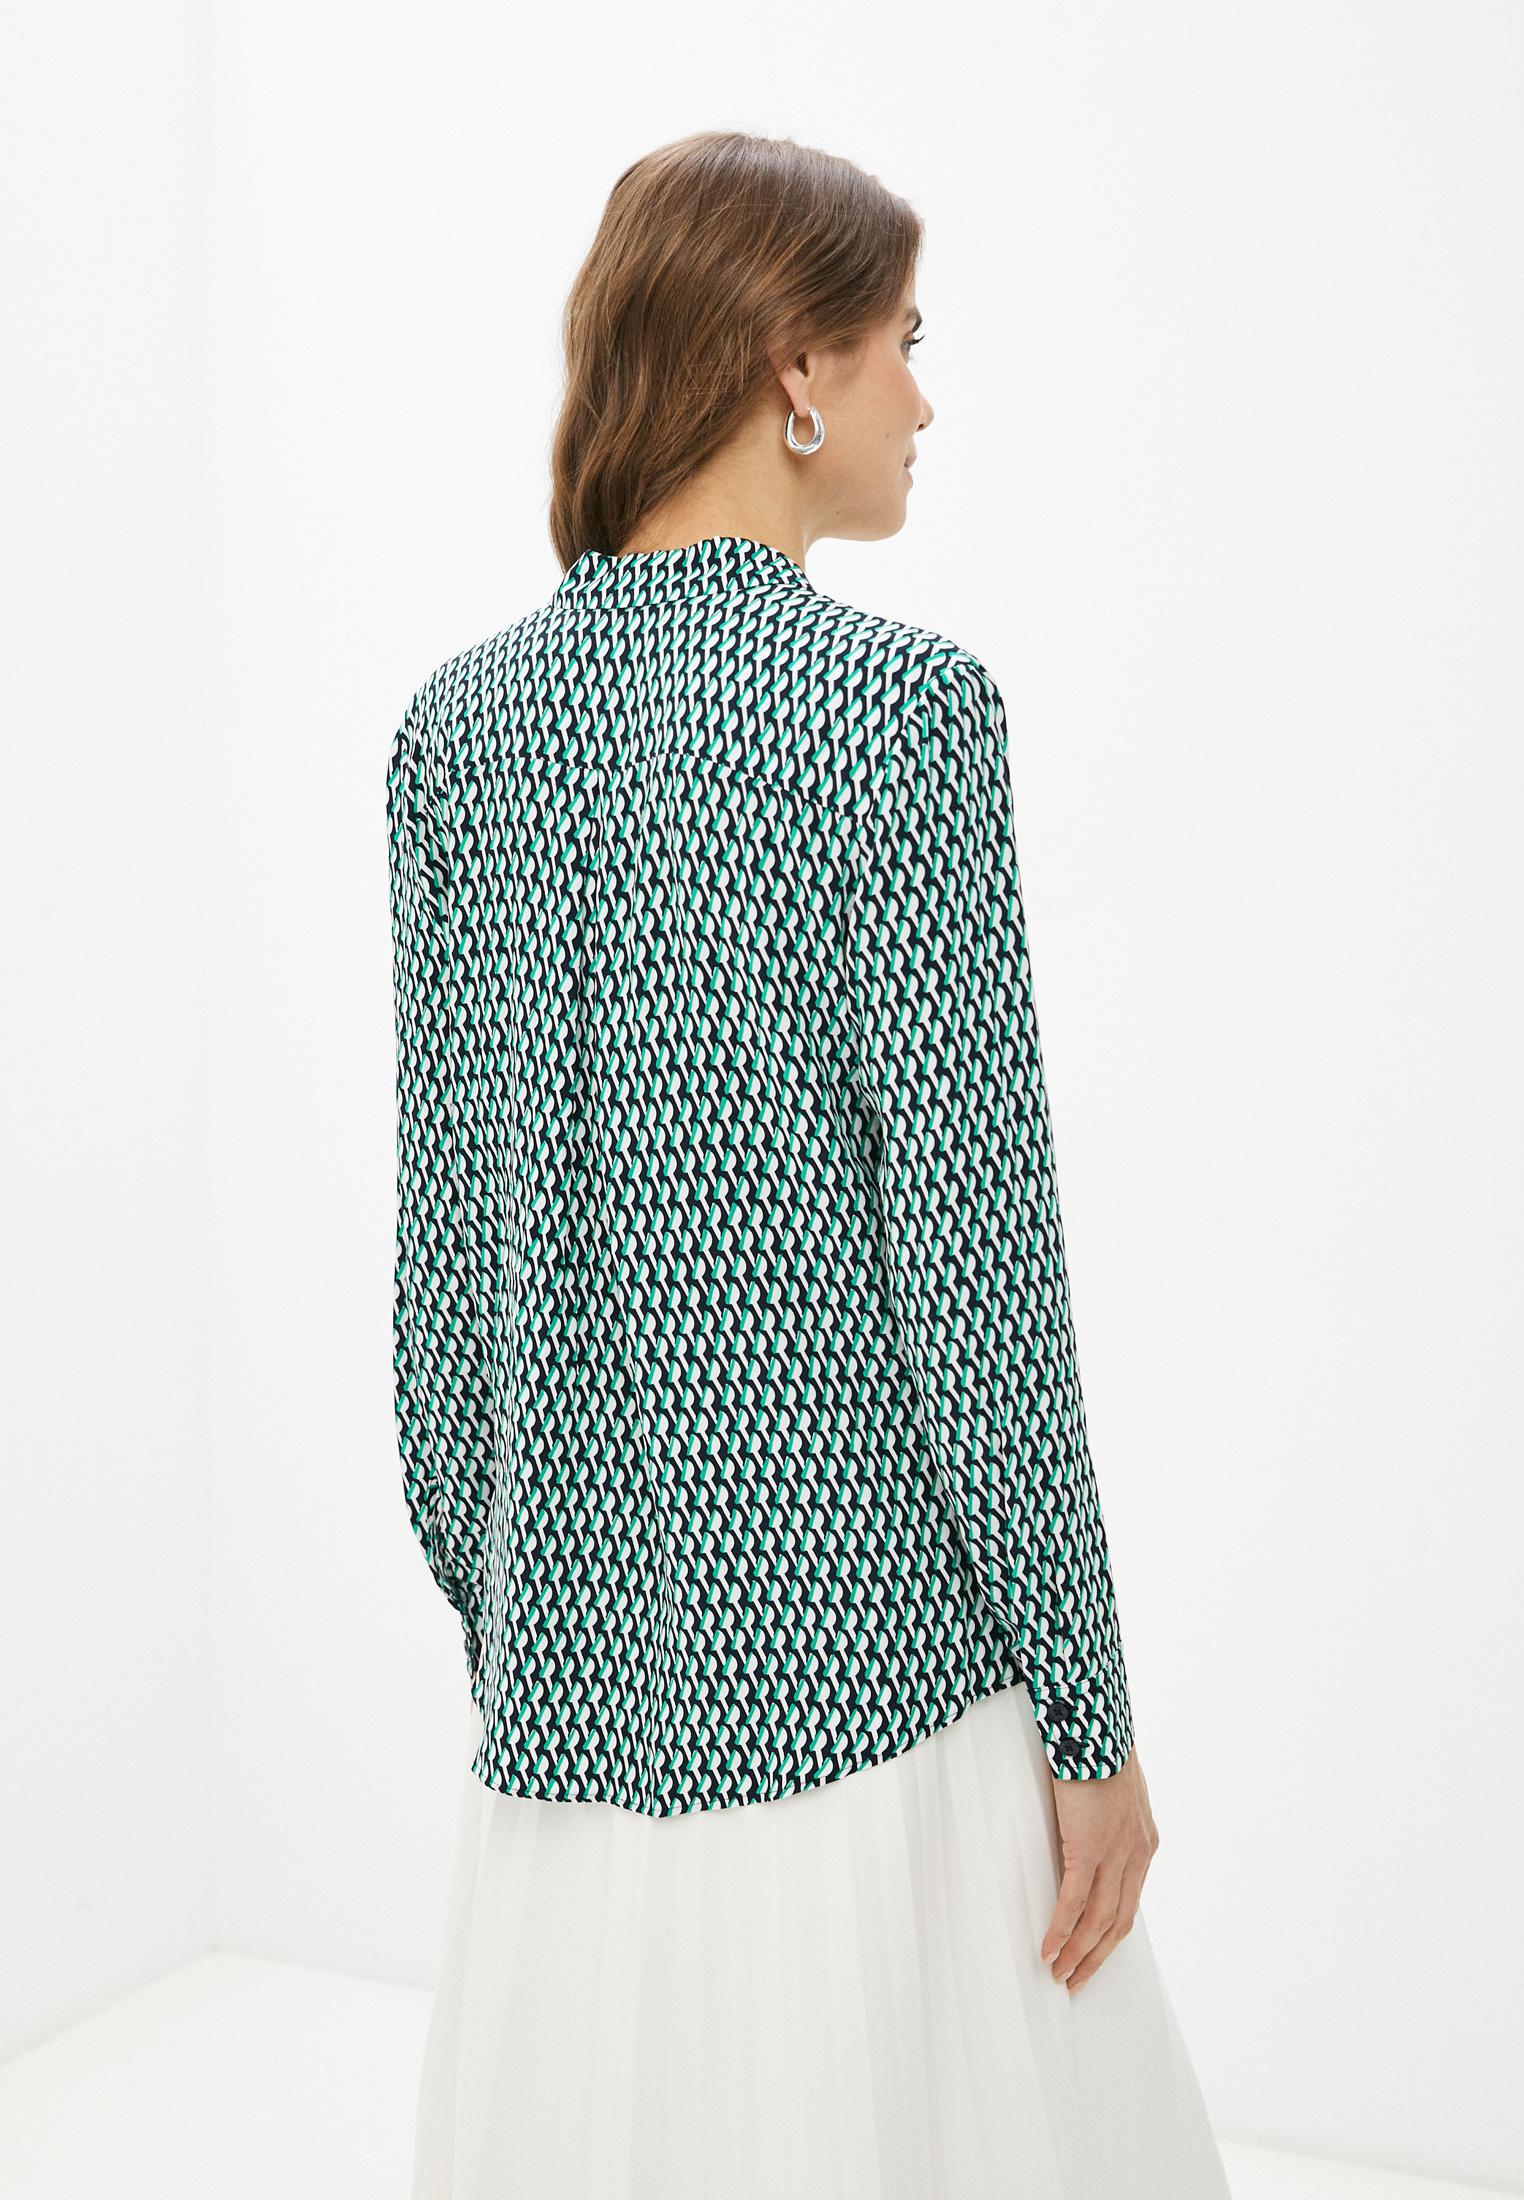 Блуза Tommy Hilfiger (Томми Хилфигер) WW0WW30290: изображение 3